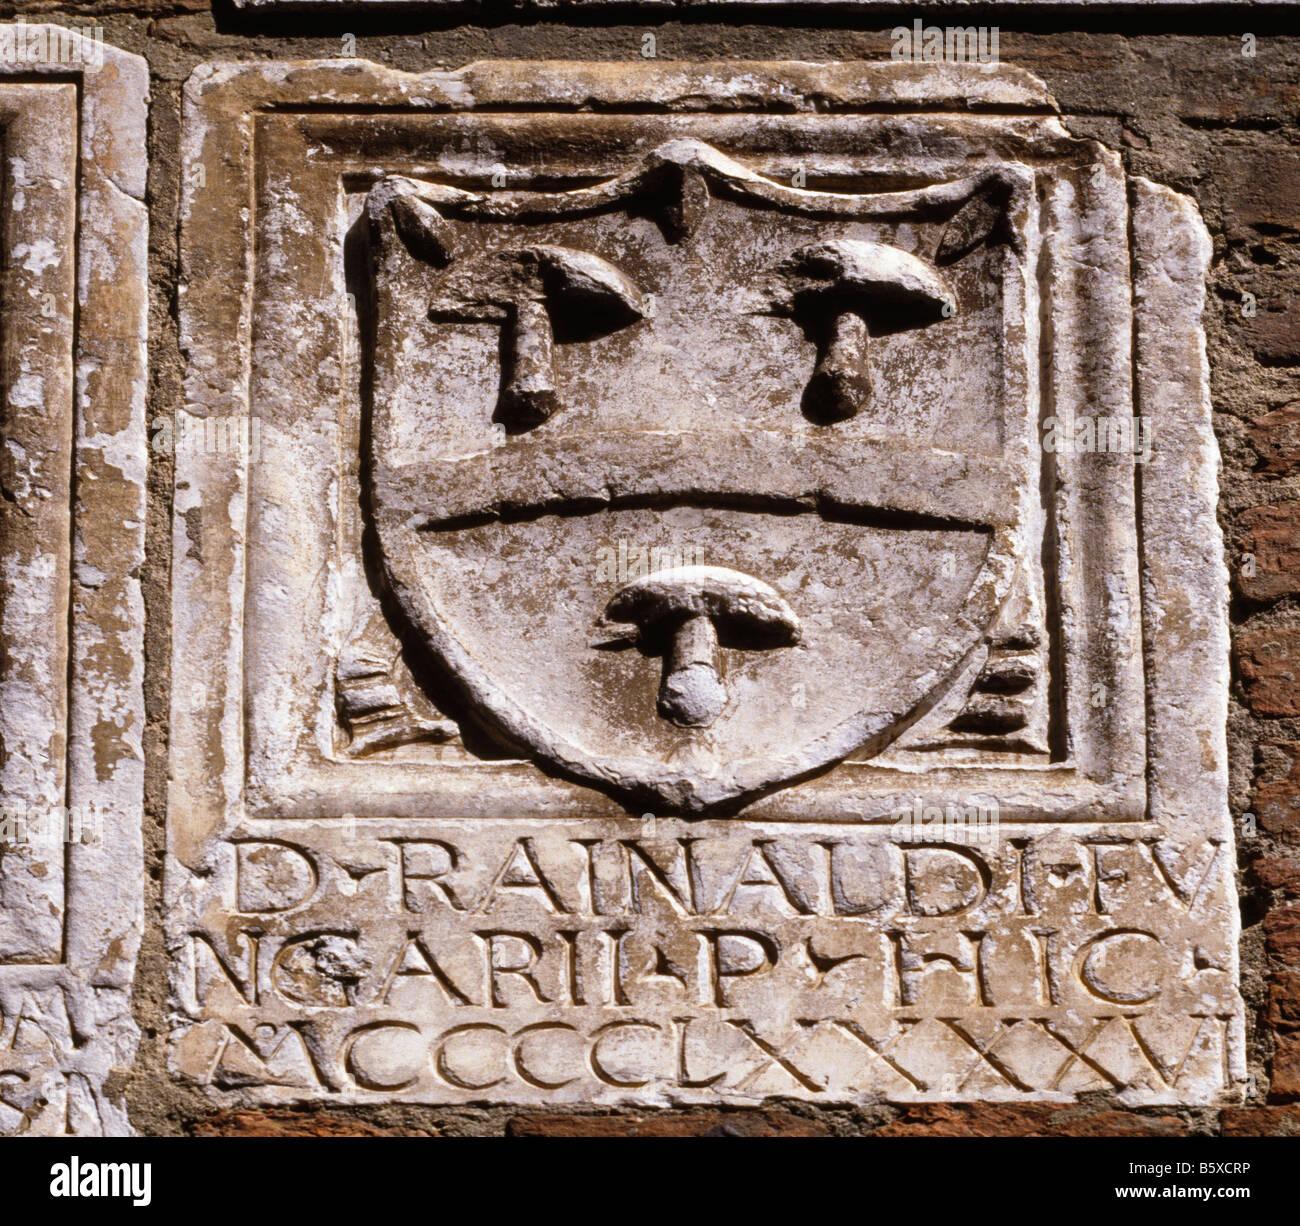 Heraldic Shields On Wall - Stock Image